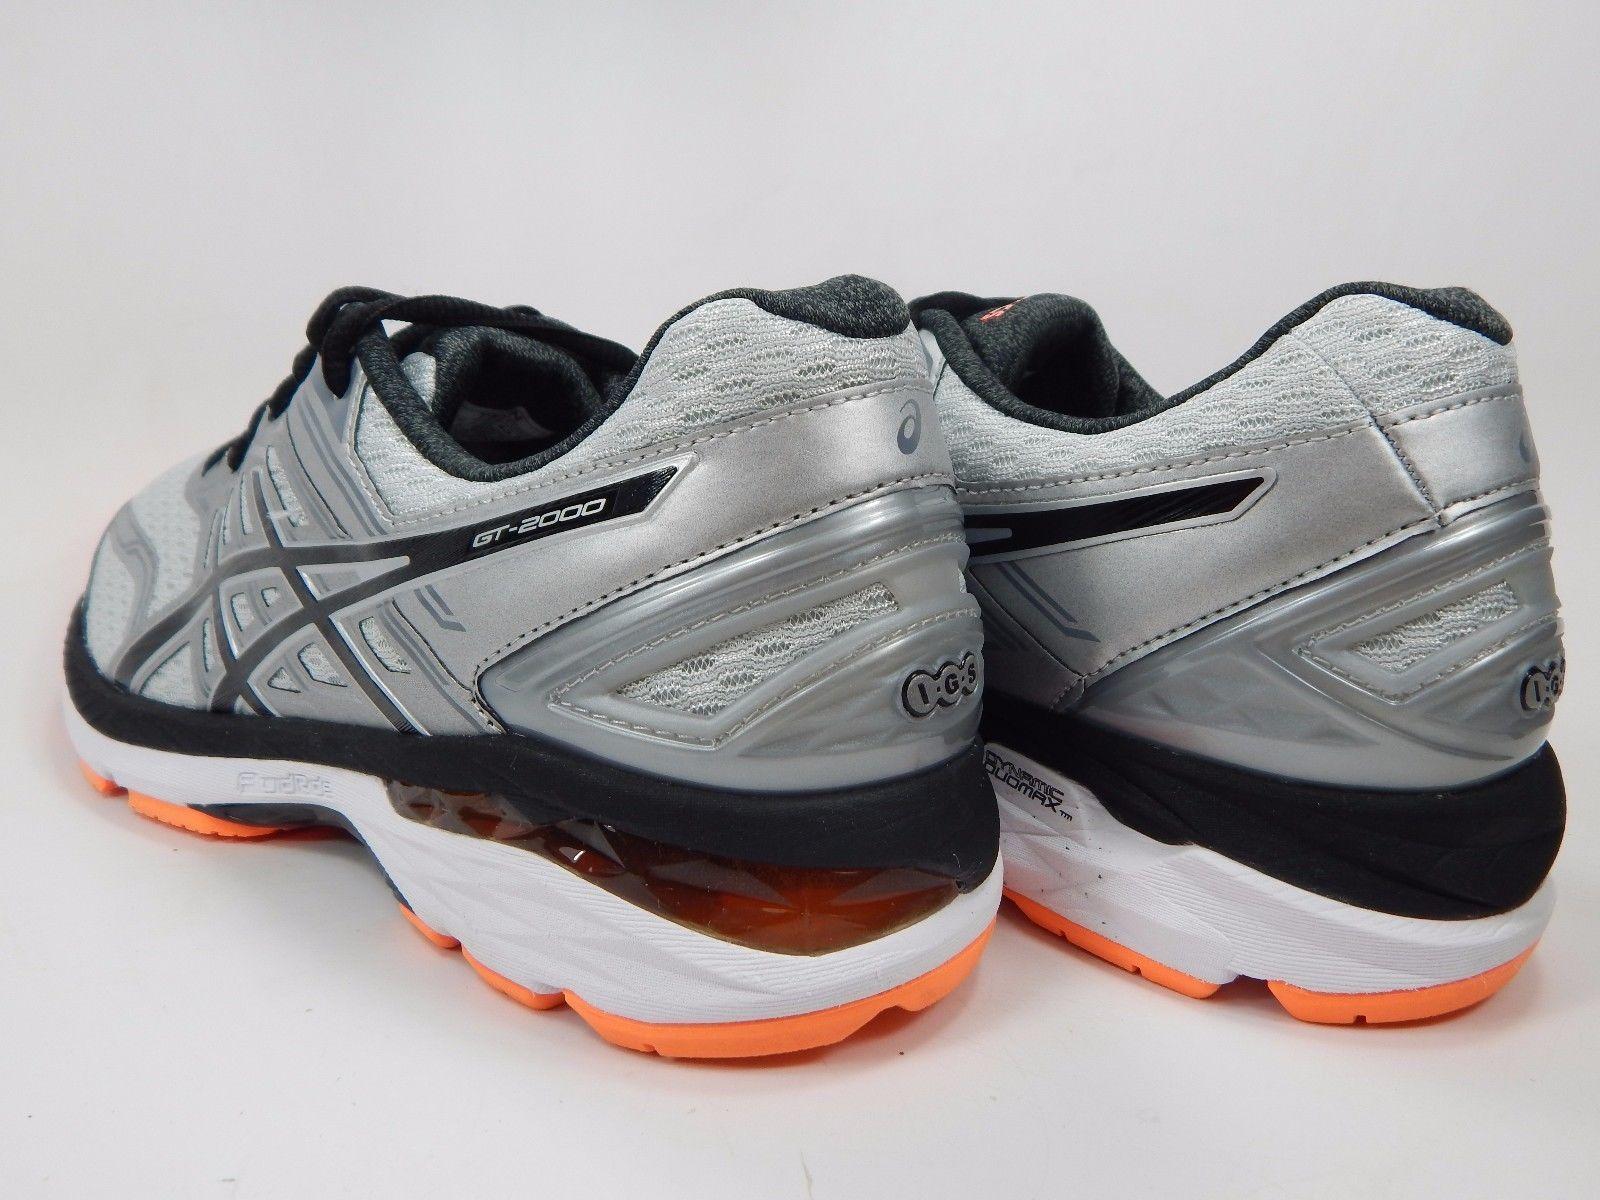 Asics GT 2000 v 5 Men's Running Shoes Sz US 9.5 M (D) EU 43.5 Black Silver T707N